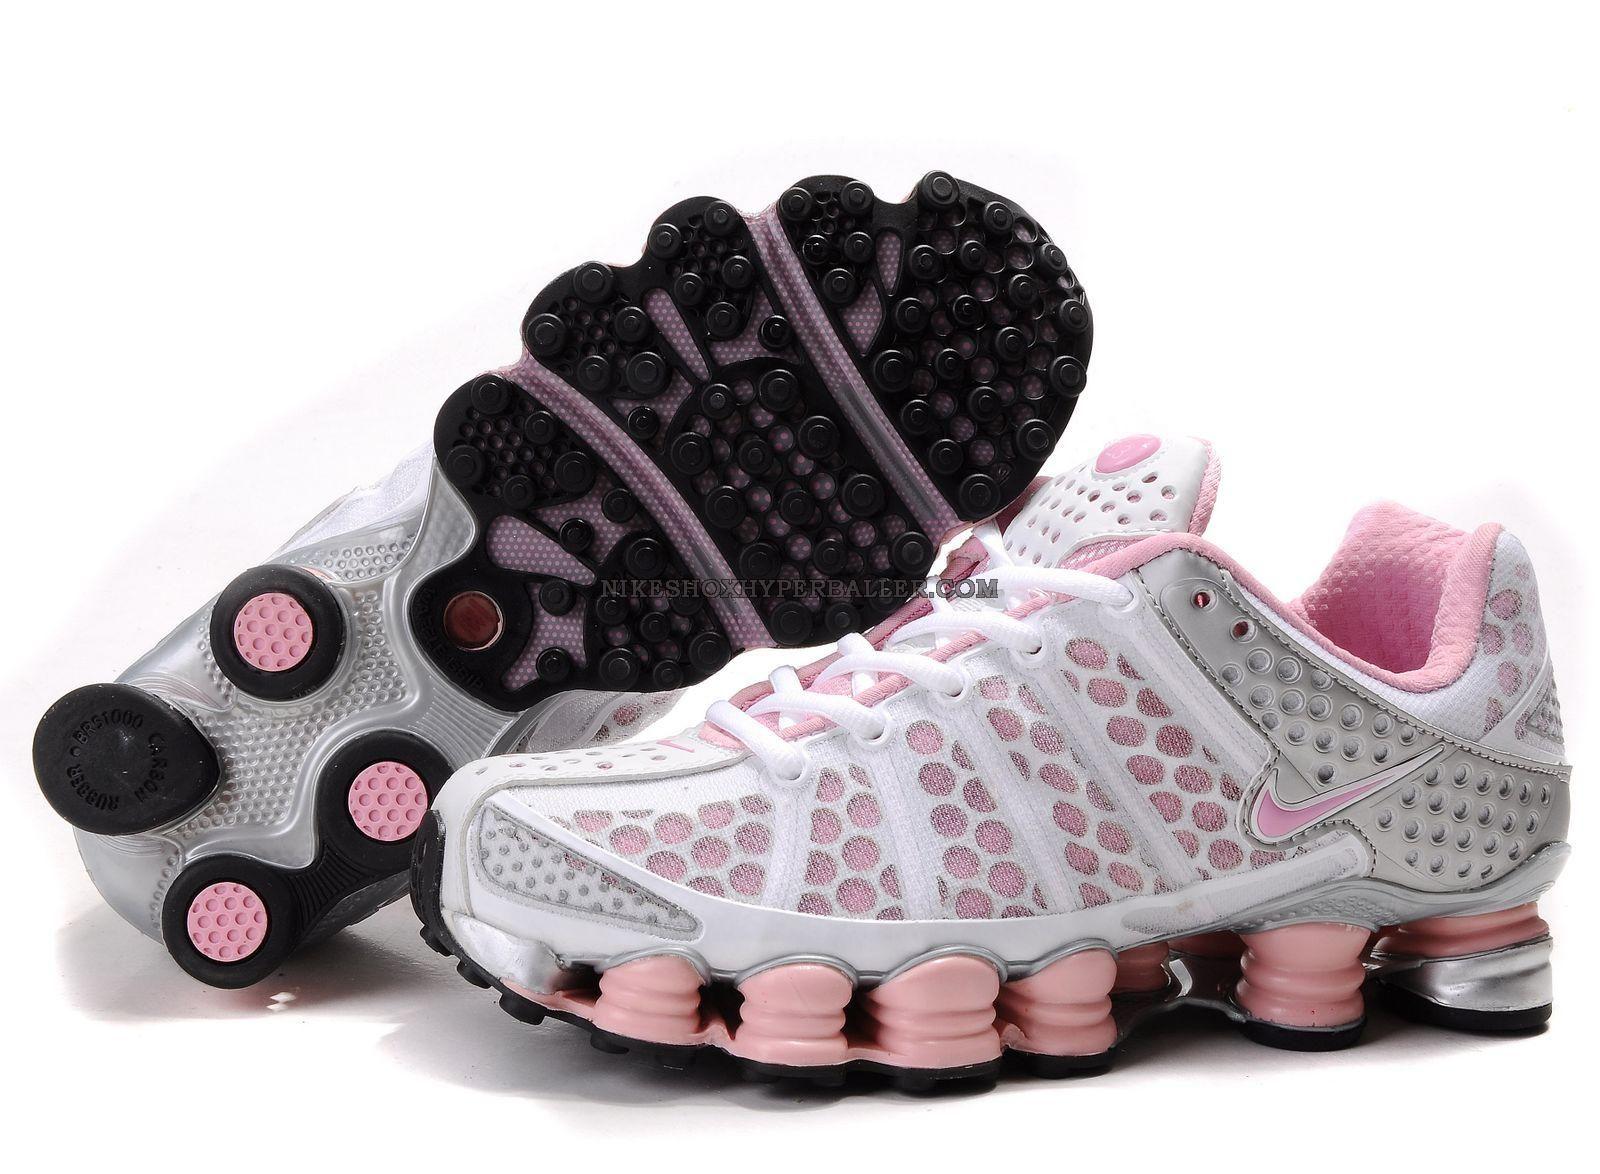 Nike shox pink and white